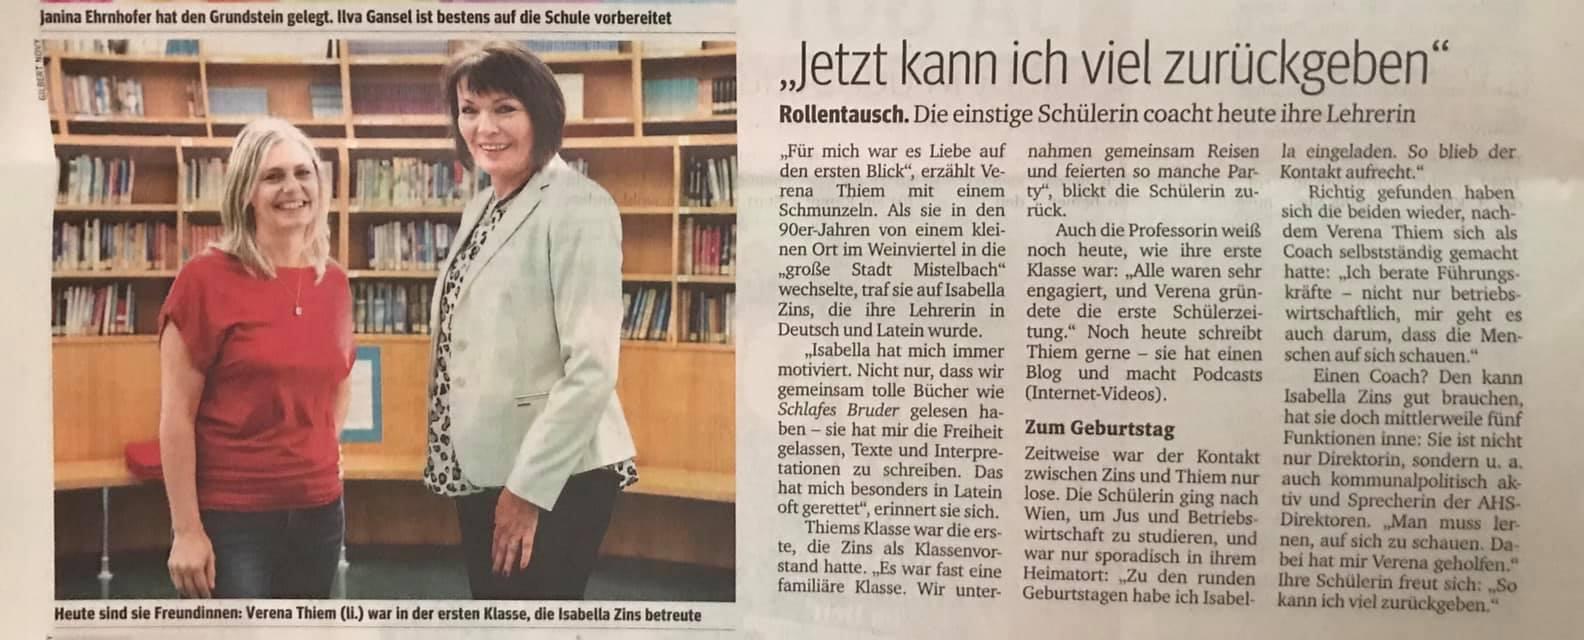 Verena Thiem Isabella Zins Kurier Artikel 28.9.2019 Lehrer Schüler Doppelporträt